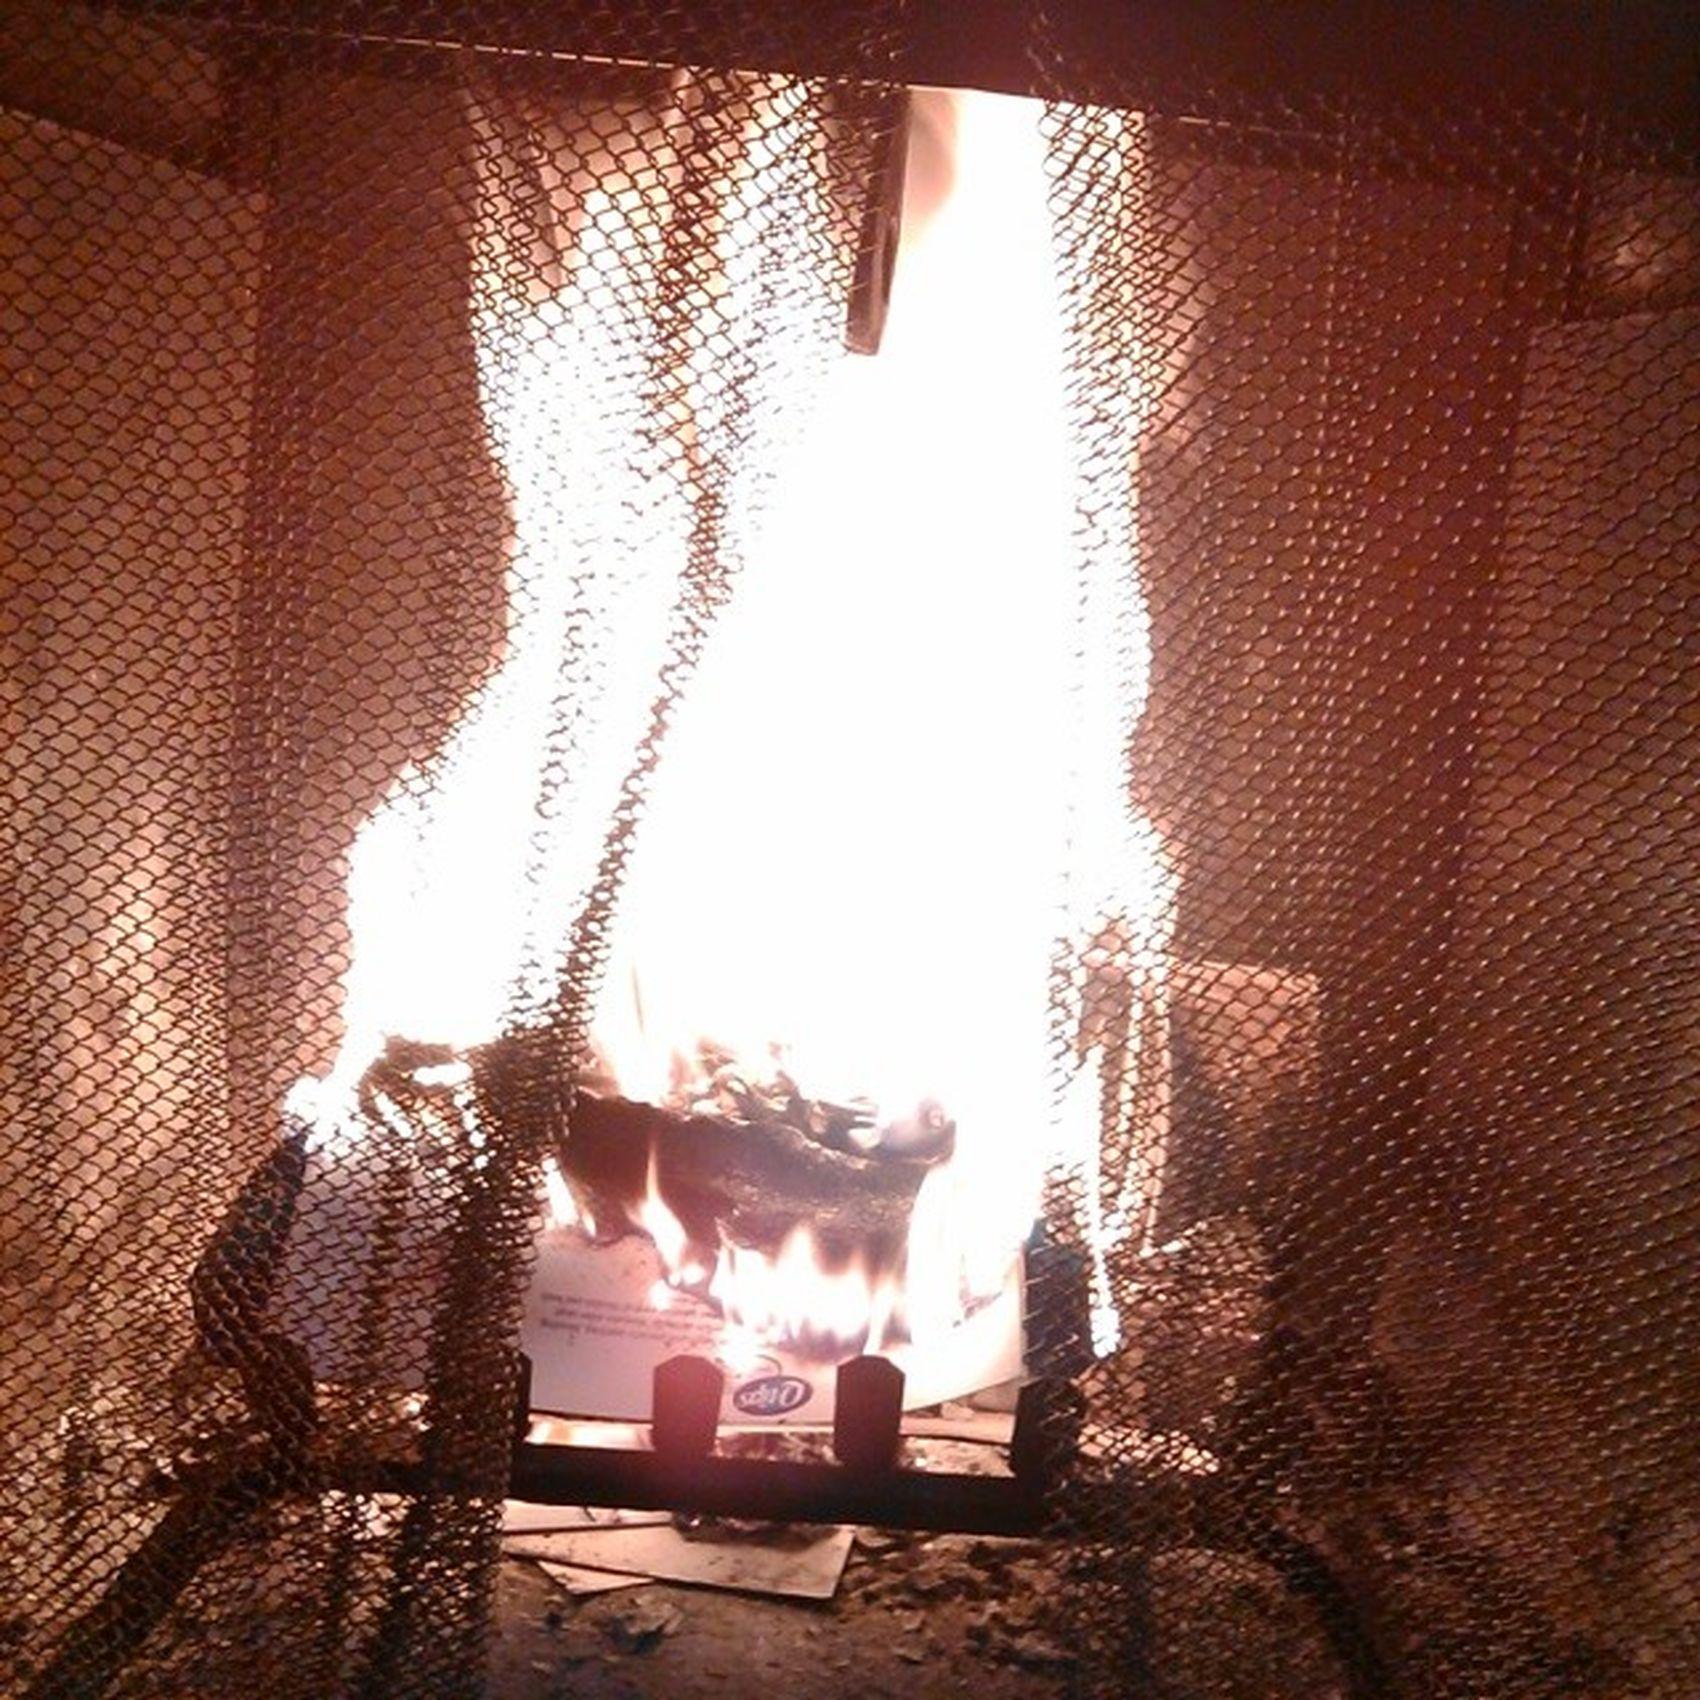 Come on baby light my fire Overcast Chilly Myfavoritekindofday Warmupbythefire